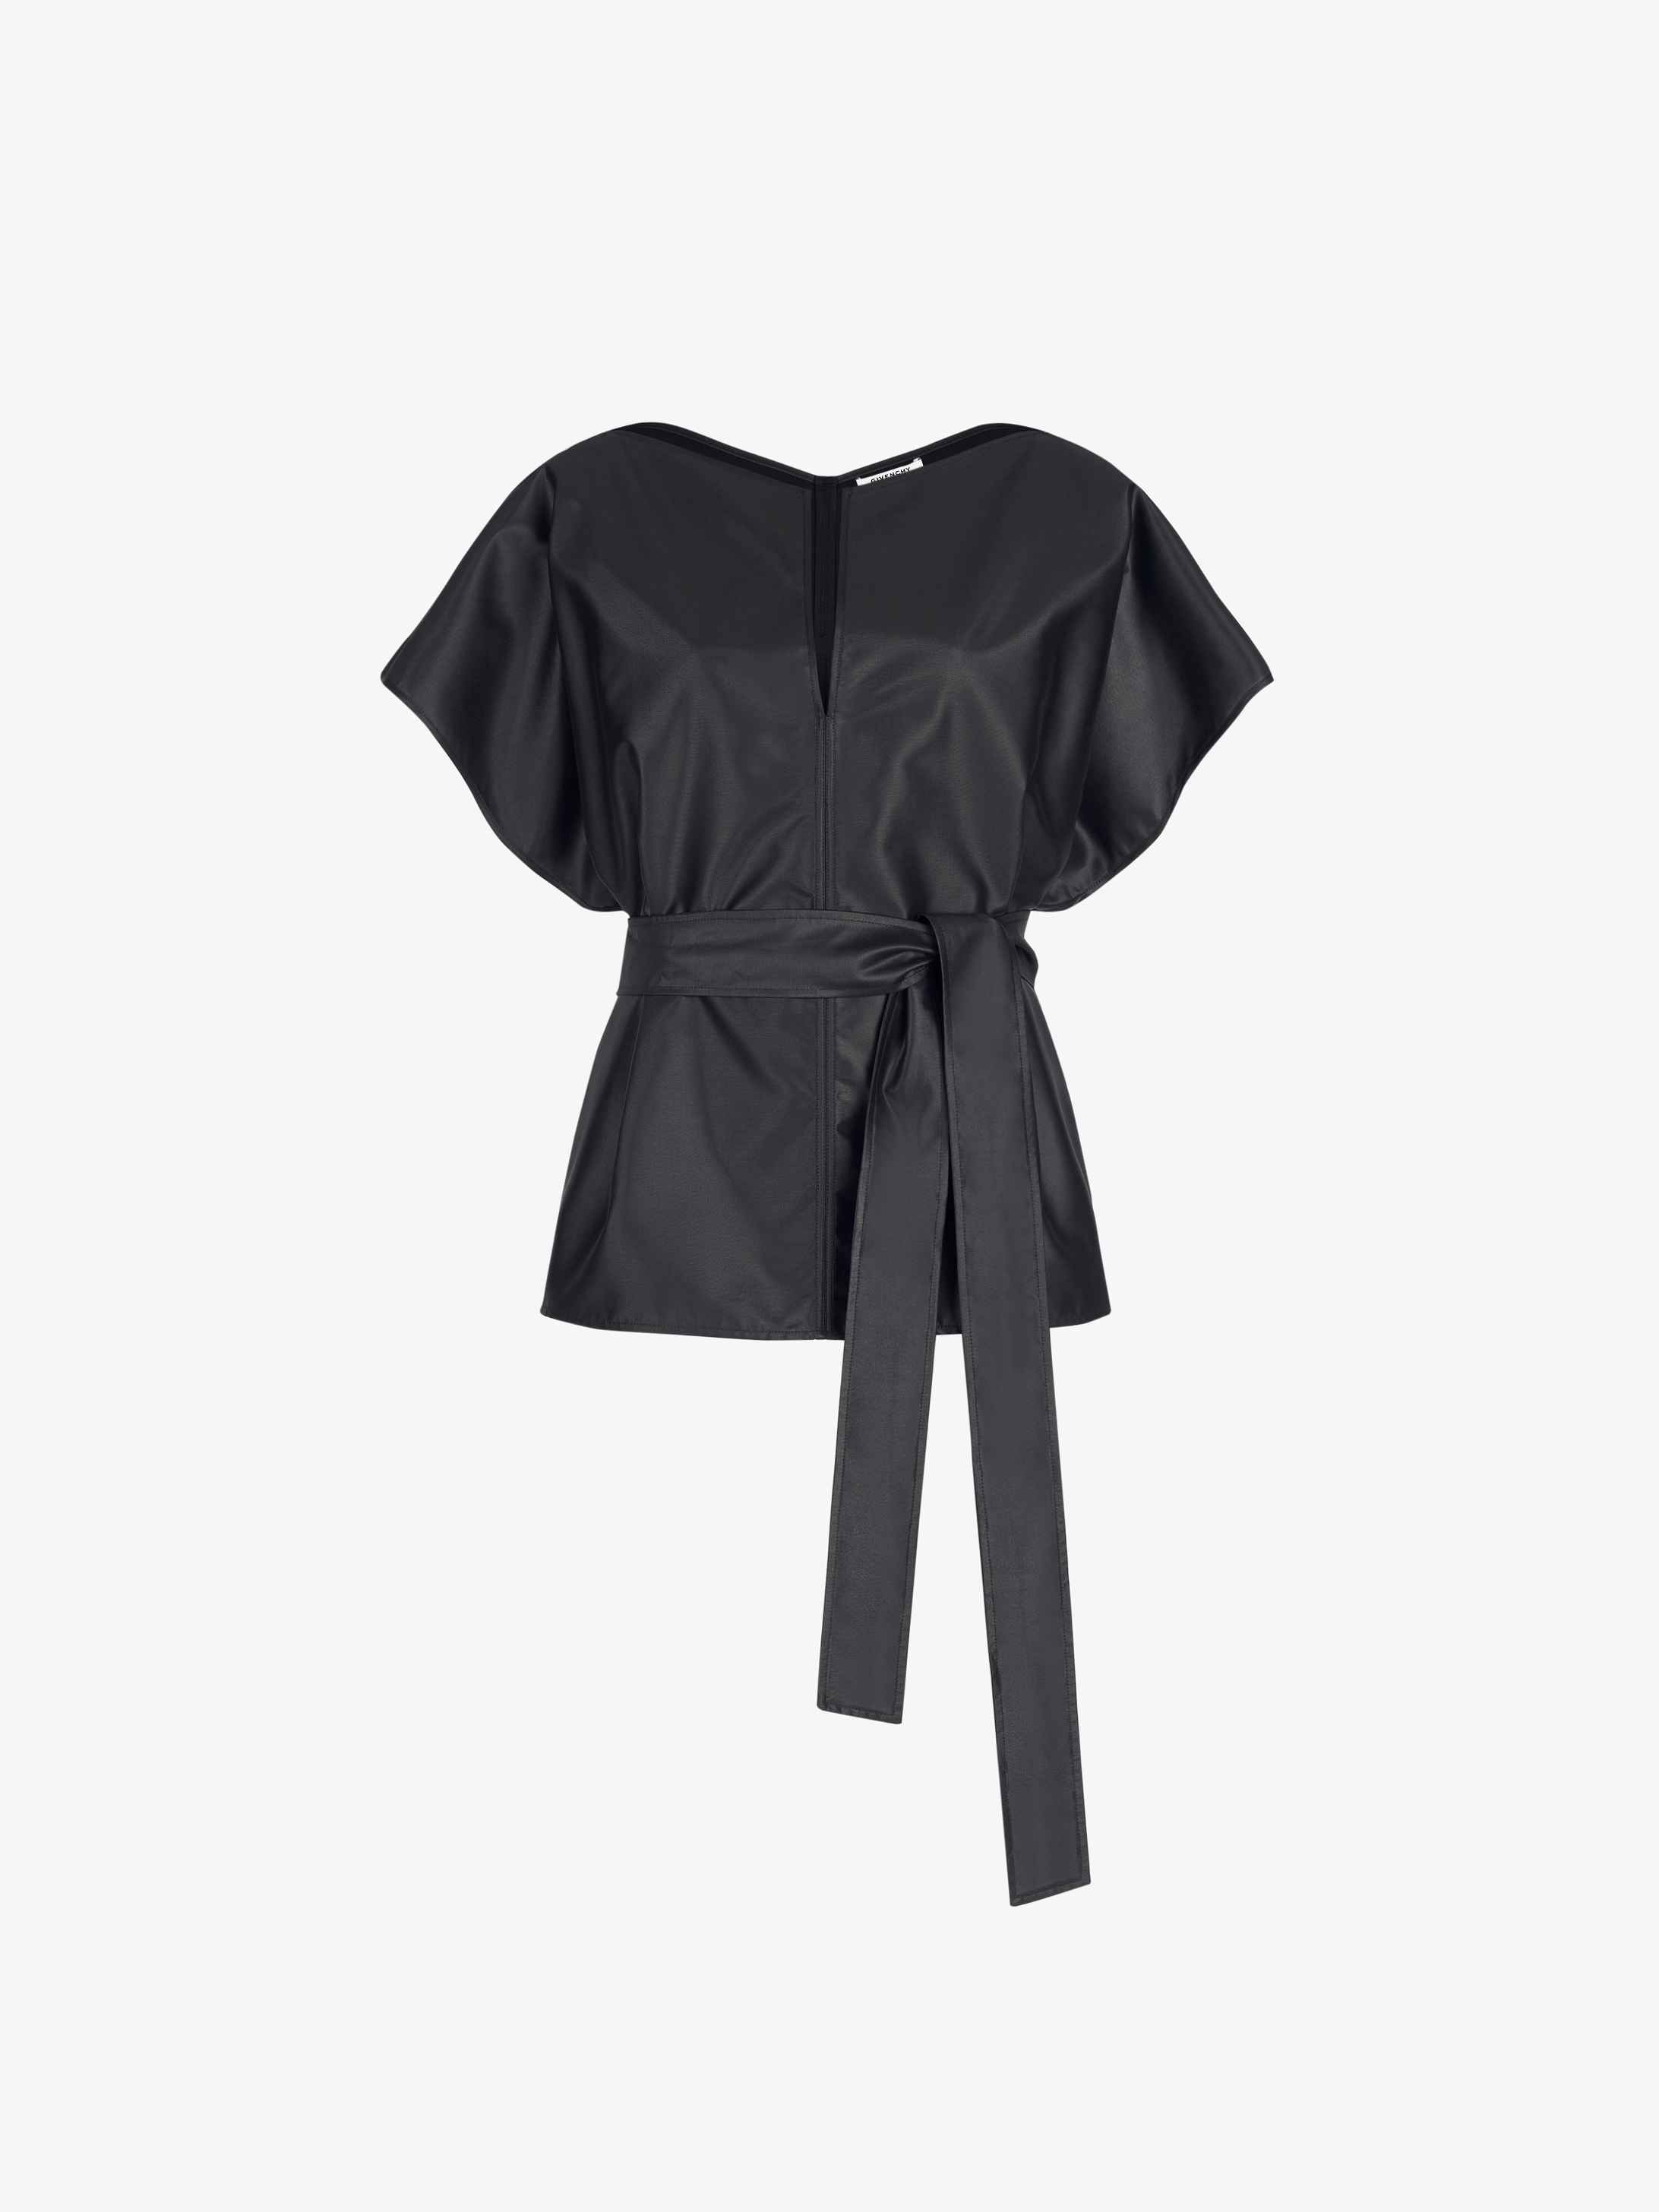 Belted short sleeves top